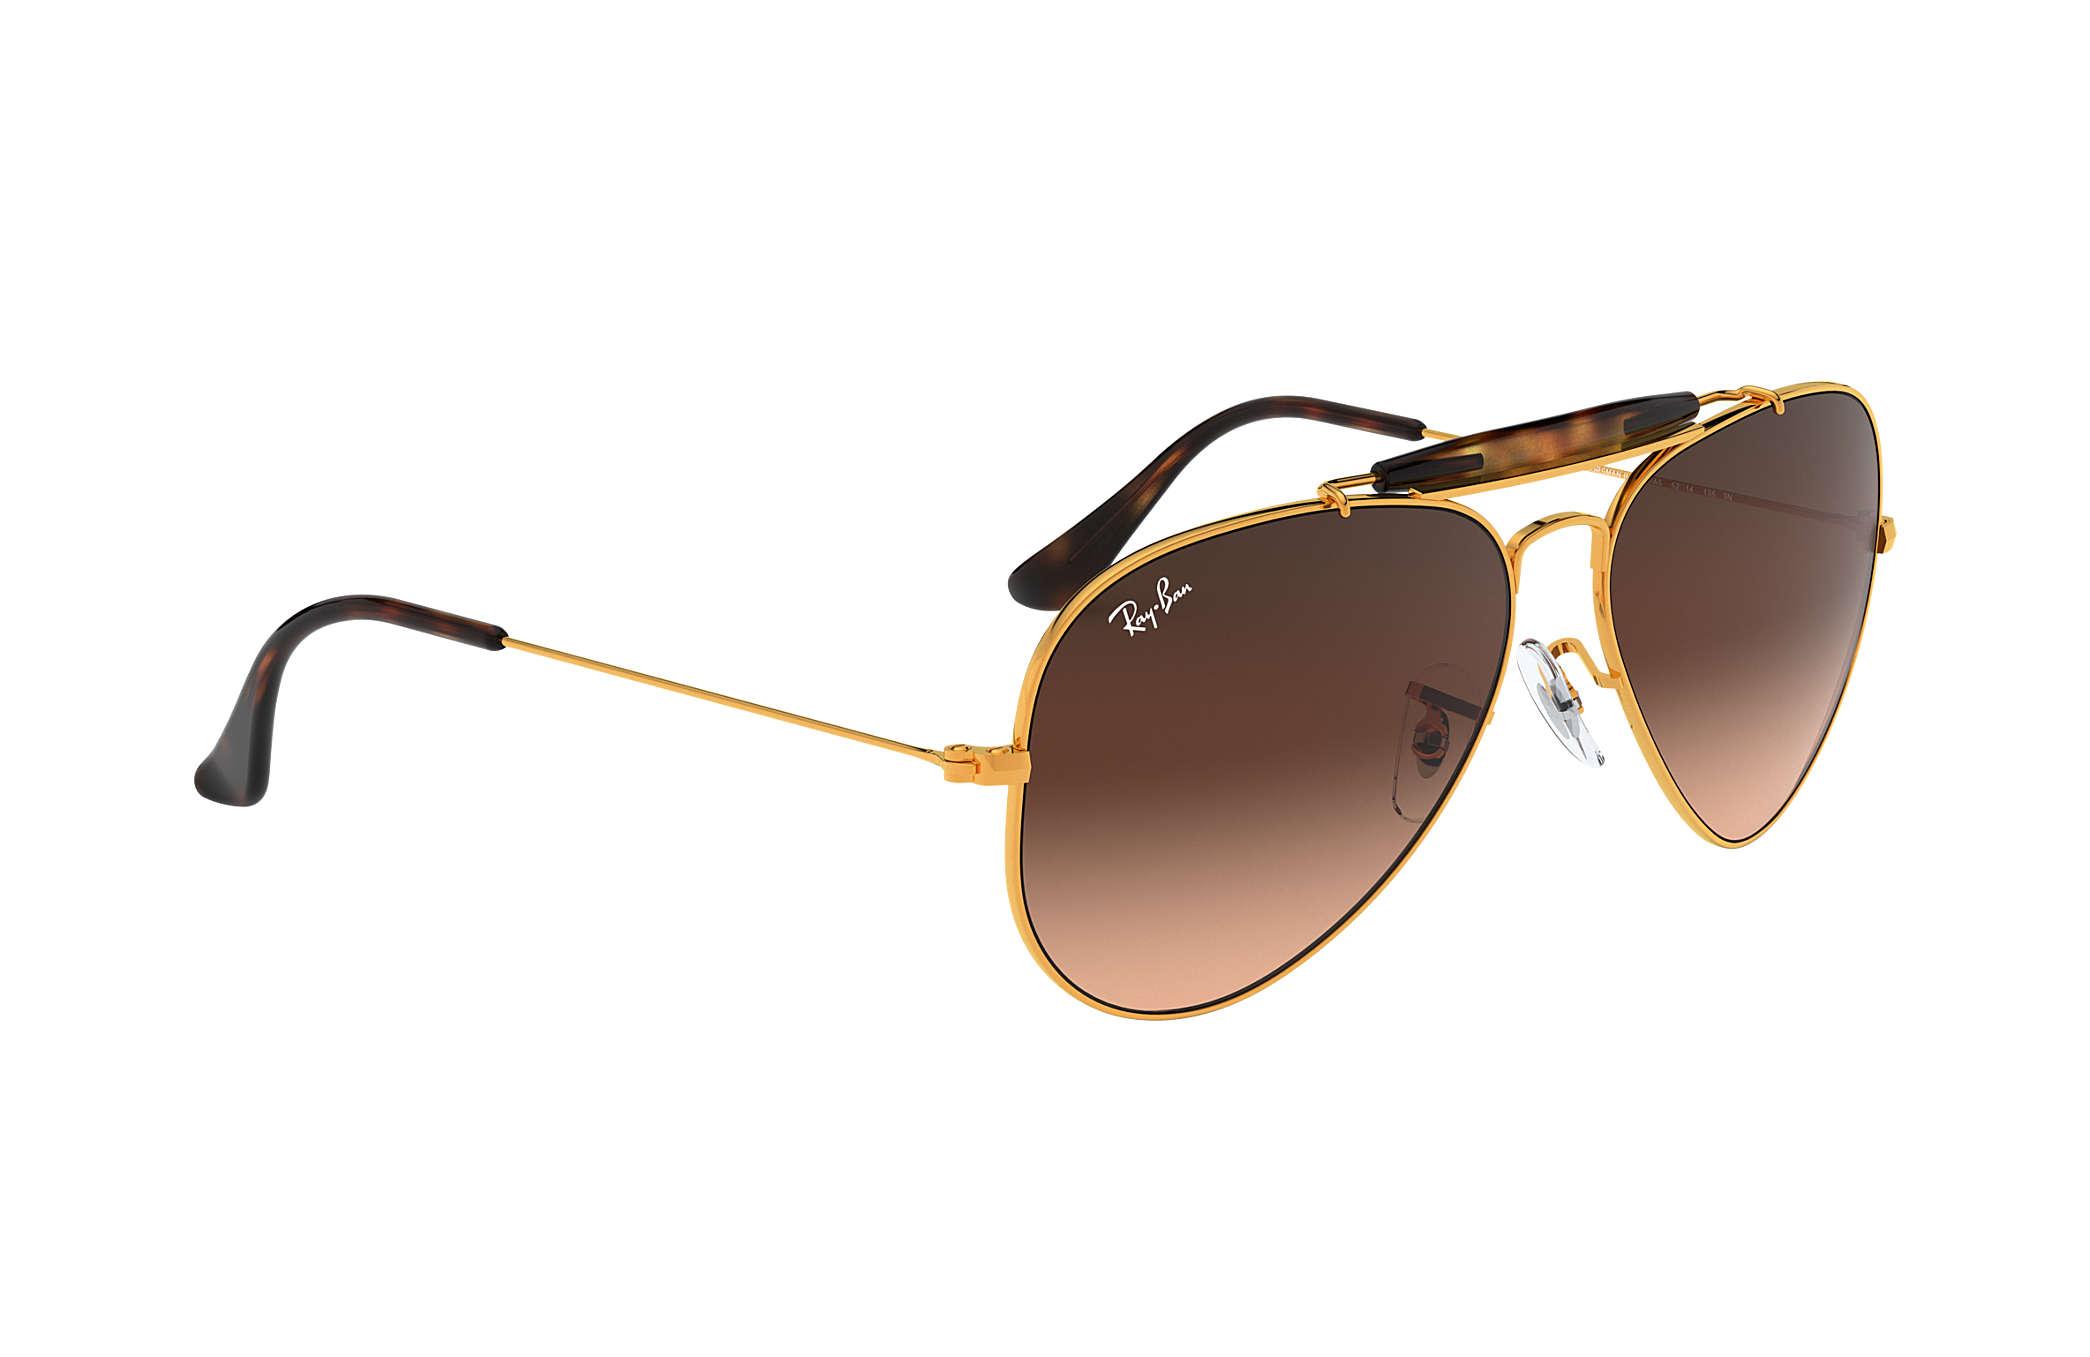 9bdf5971a6 Ray-Ban Outdoorsman Ii RB3029 Bronze-Copper - Metal - Pink Brown ...